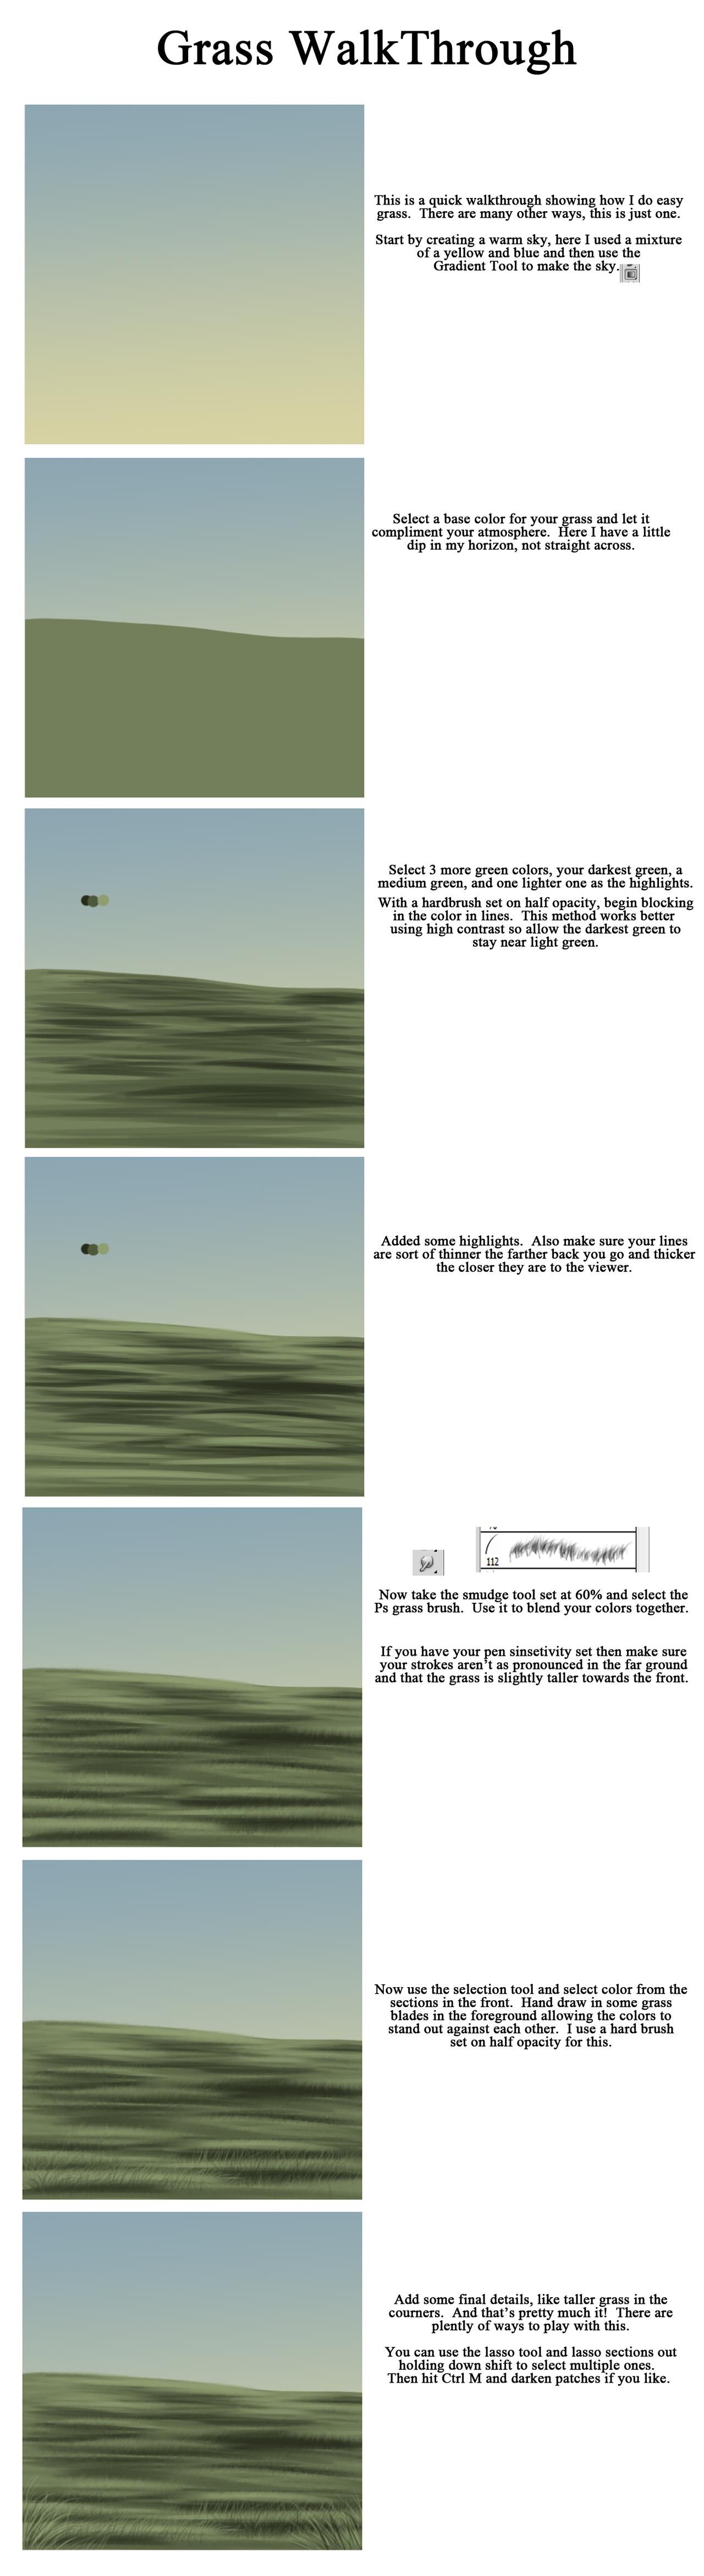 Grass Walkthrough by sVa-BinaryStar